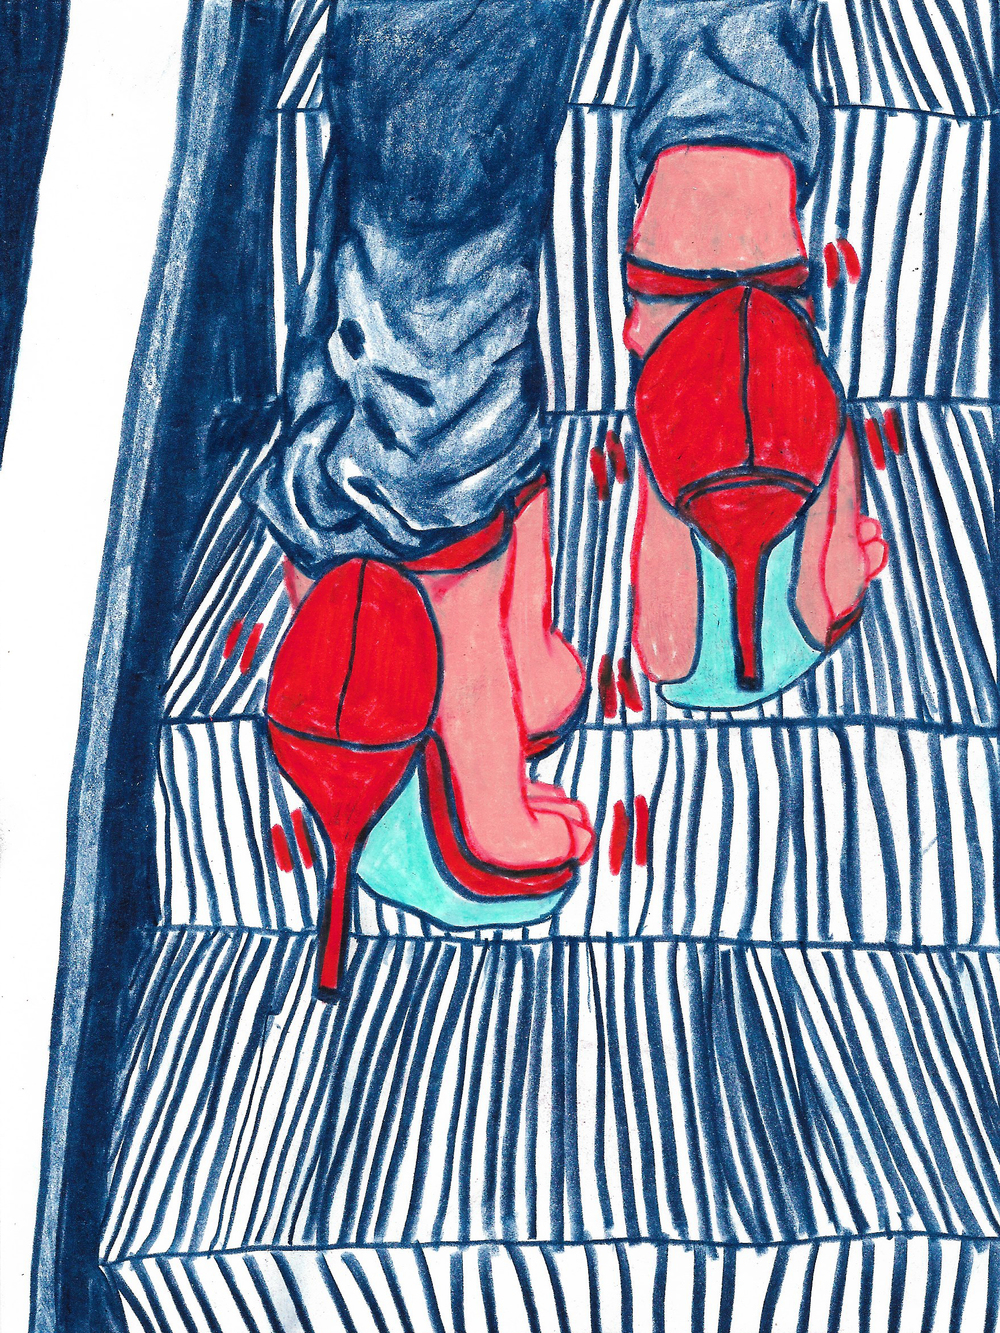 Wobbly Stilettos on Escalators